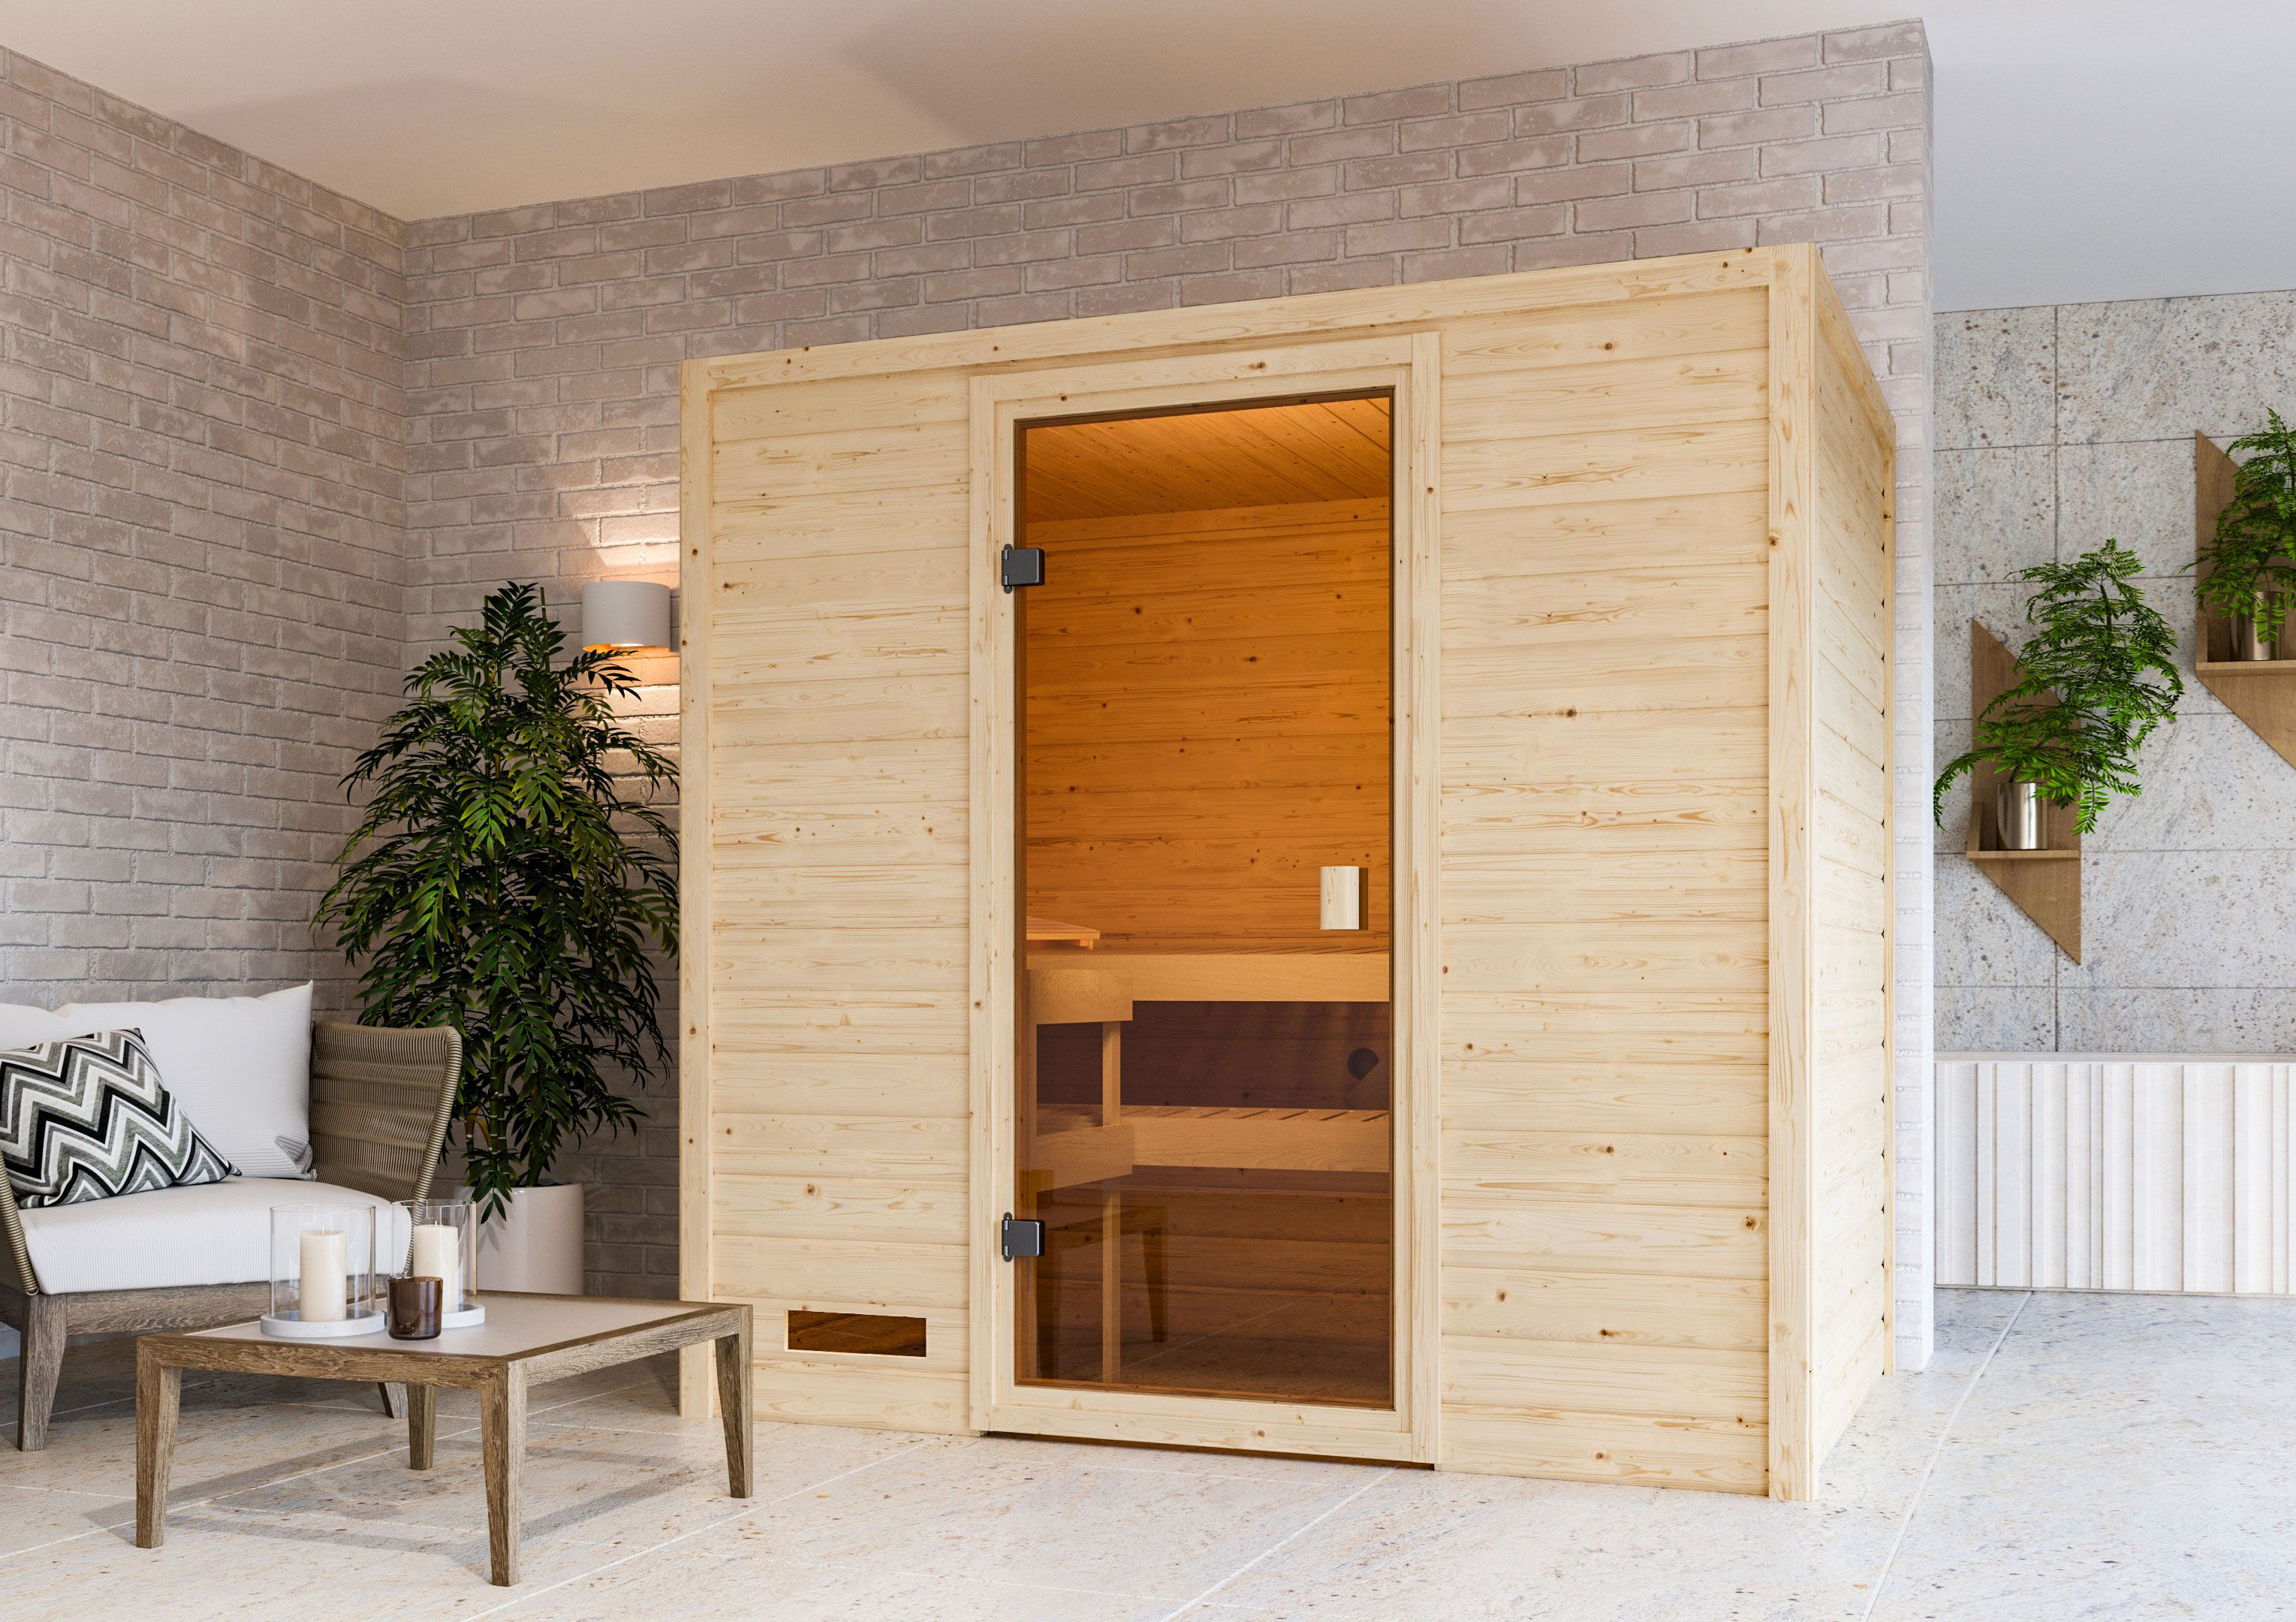 Woodfeeling Sauna Selena 38mm ohne Saunaofen Bild 9